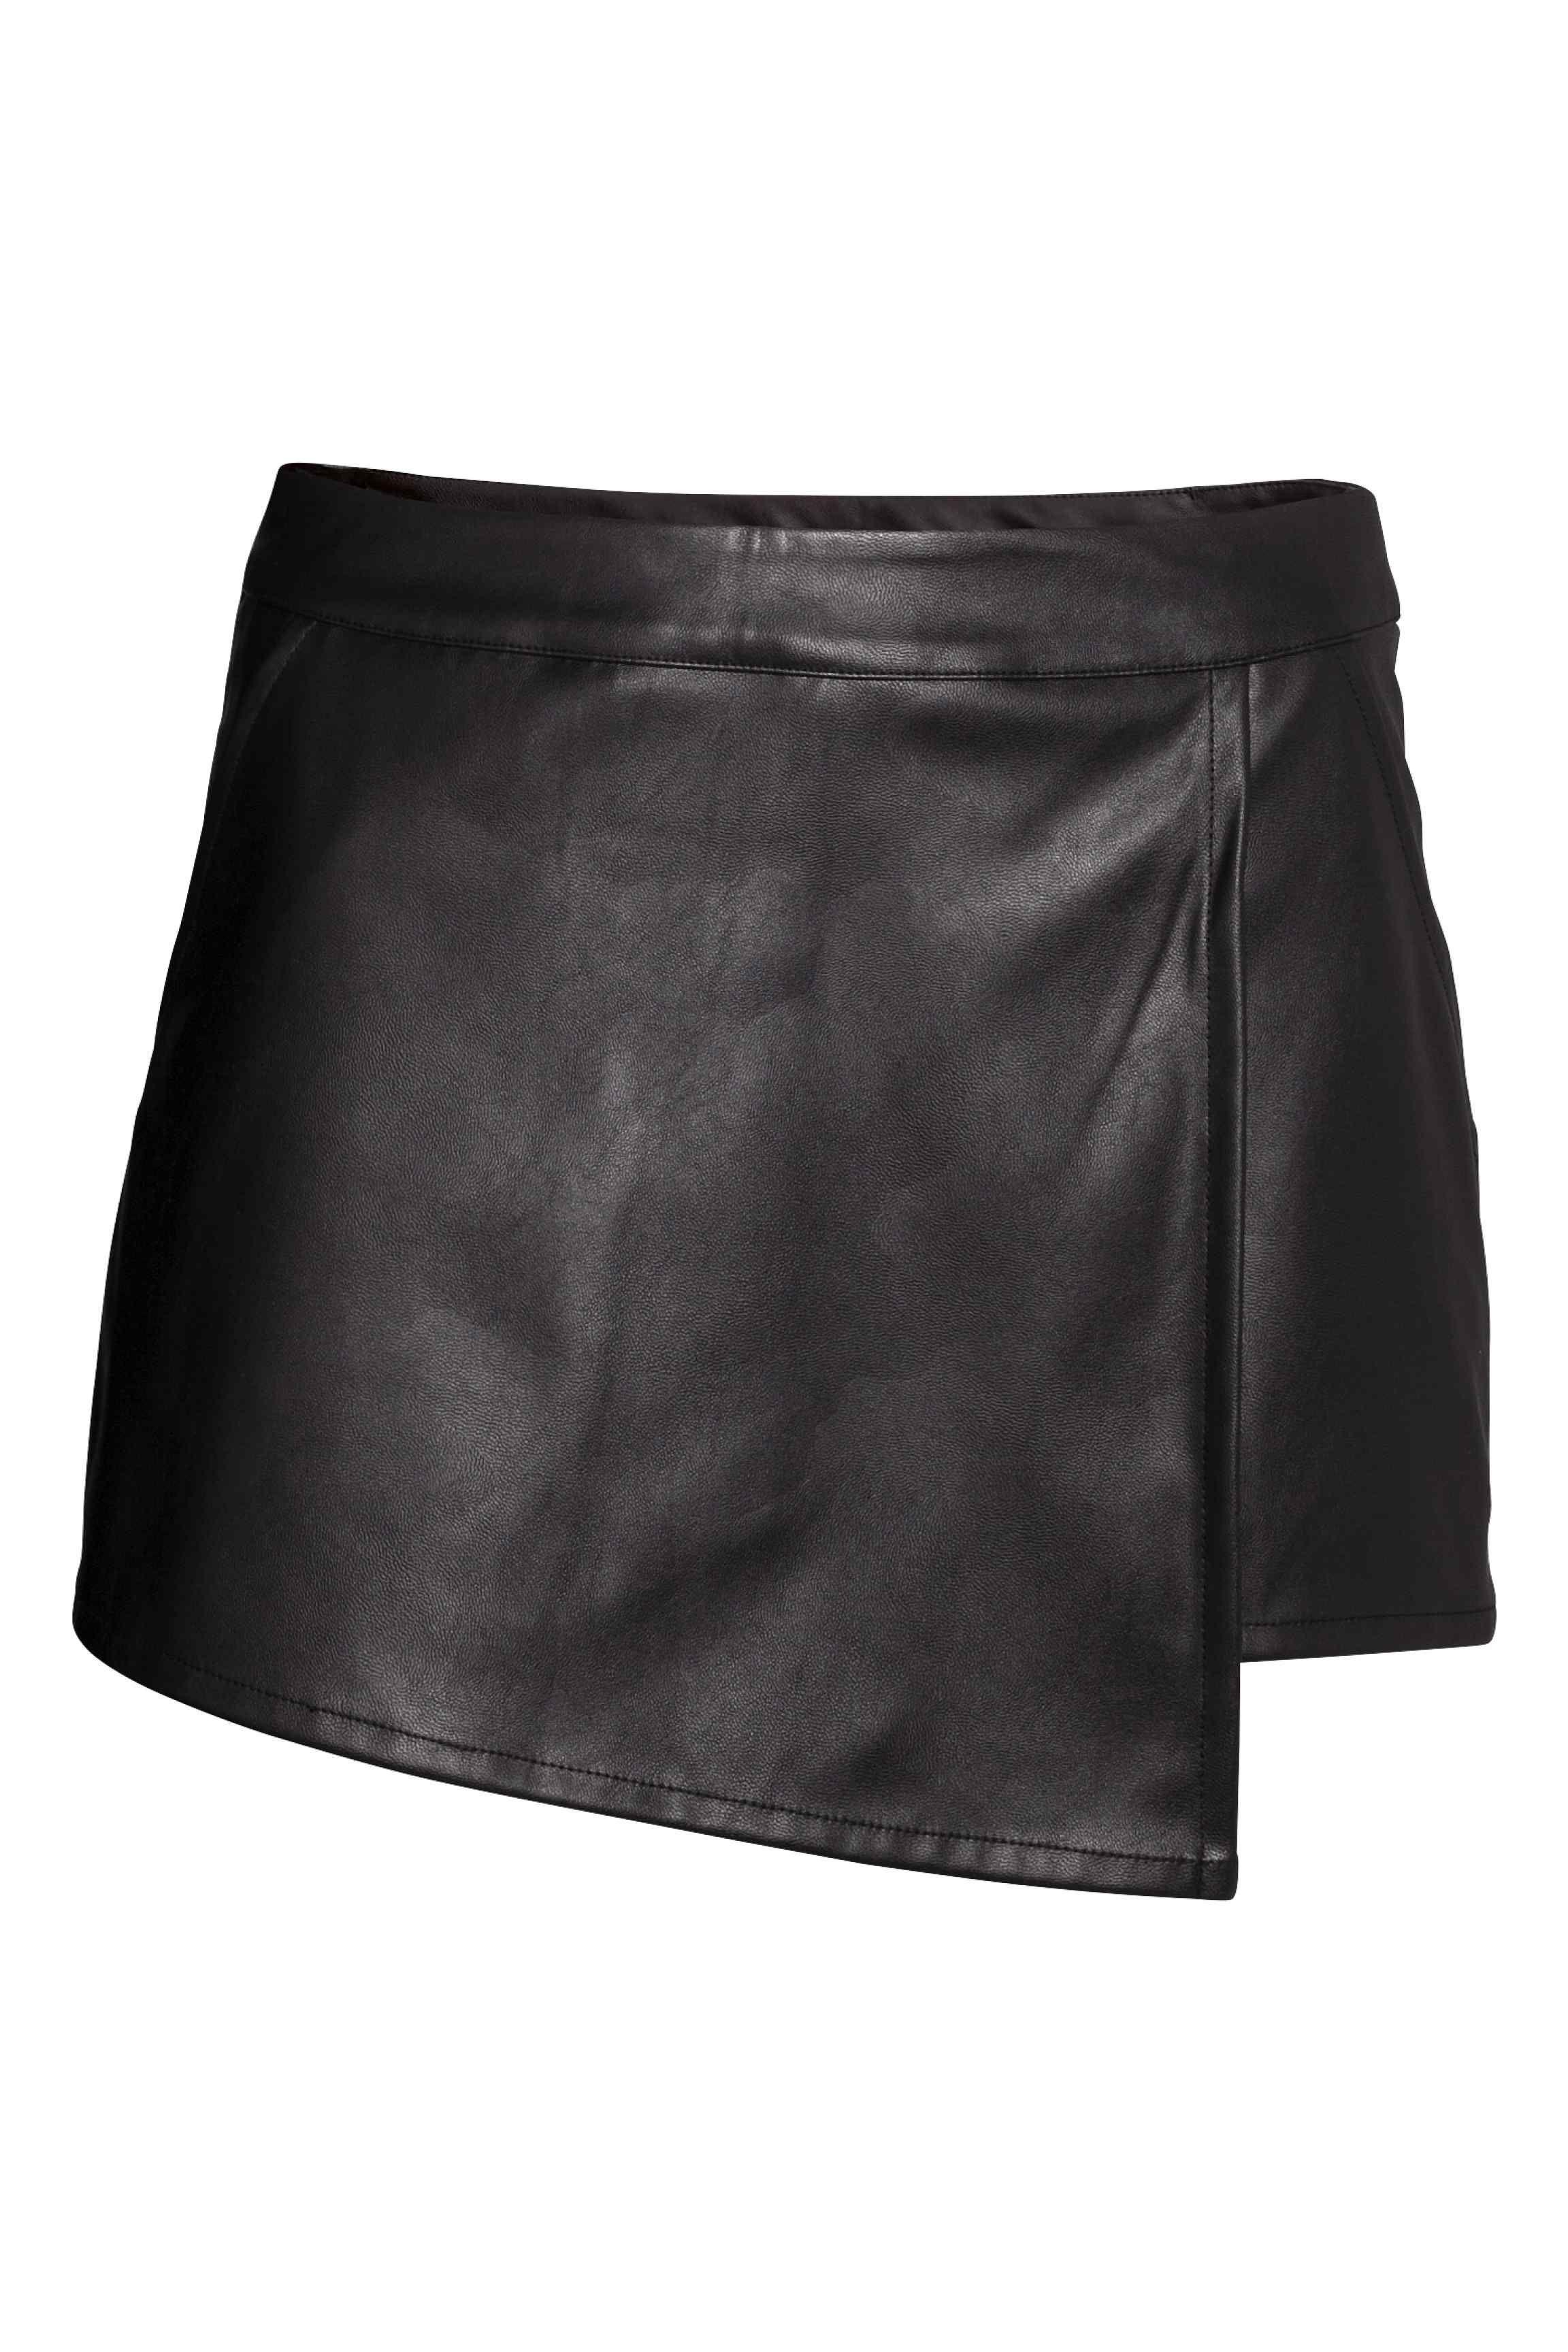 0a6666492 Pantalón corto | H&M | Fashion | Pantalones cortos negros ...